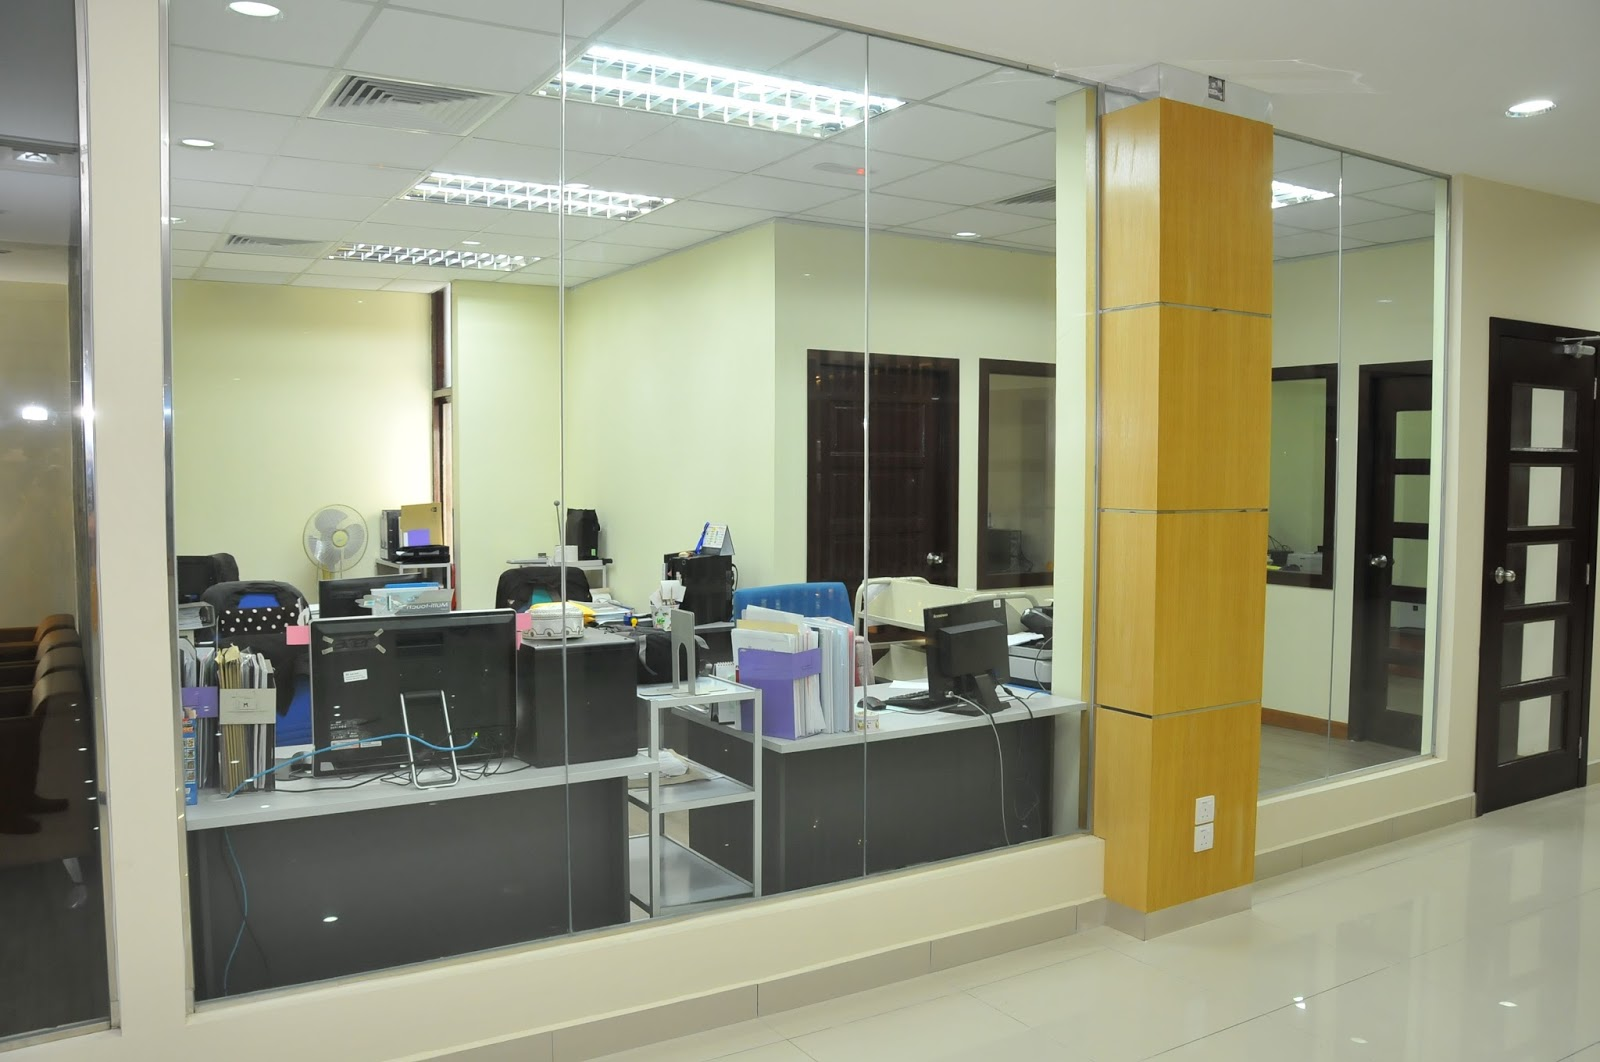 Gambar Perpustakaan Tun Abdul Razak Utama aras 2